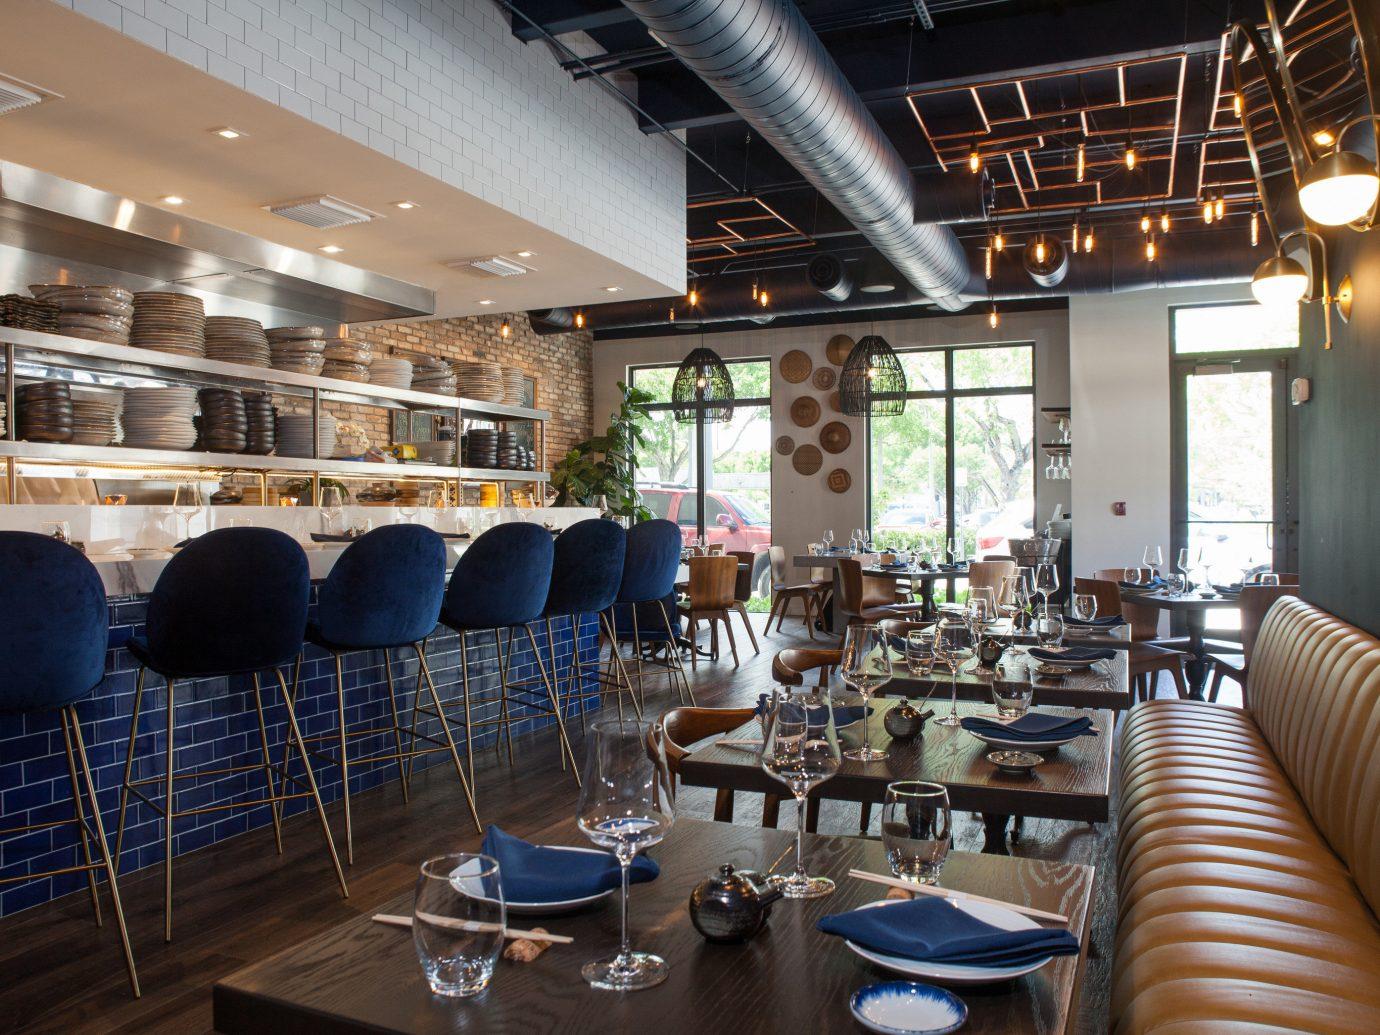 Food + Drink indoor chair restaurant ceiling interior design room café area furniture several dining room